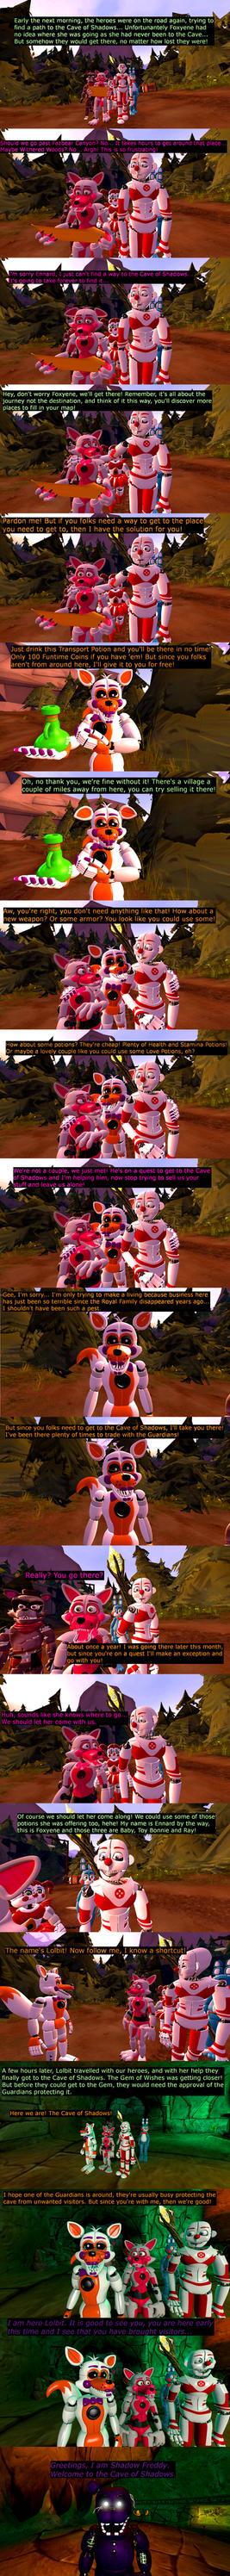 Bedtime Story 2 Part 12 by EmeraldWerewolfHeart